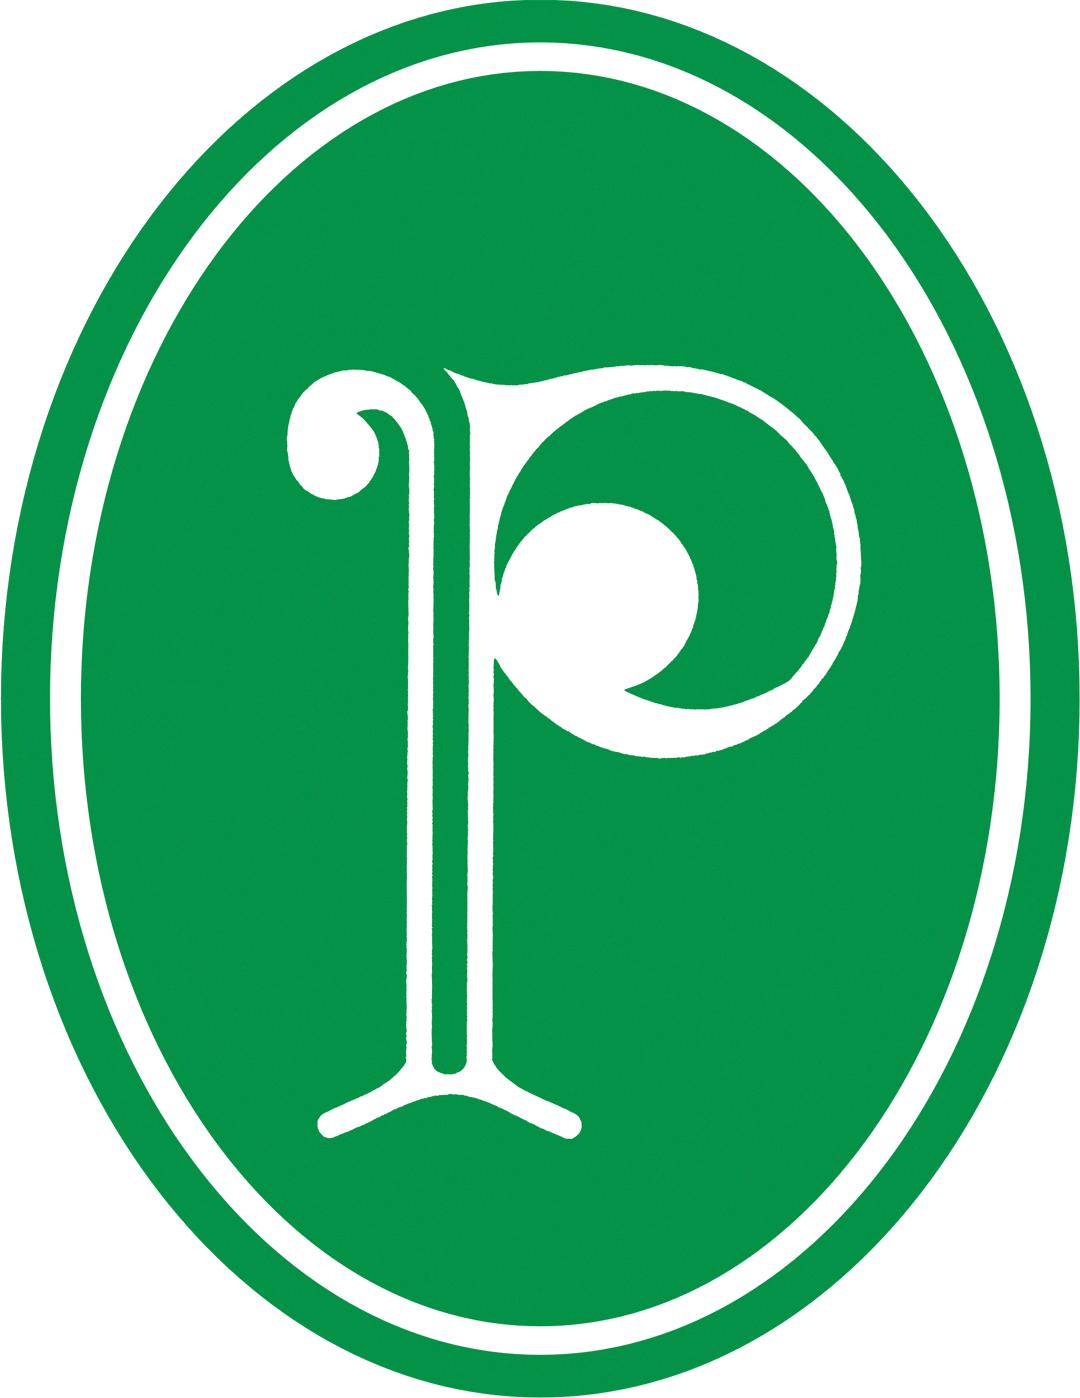 Pothys Store